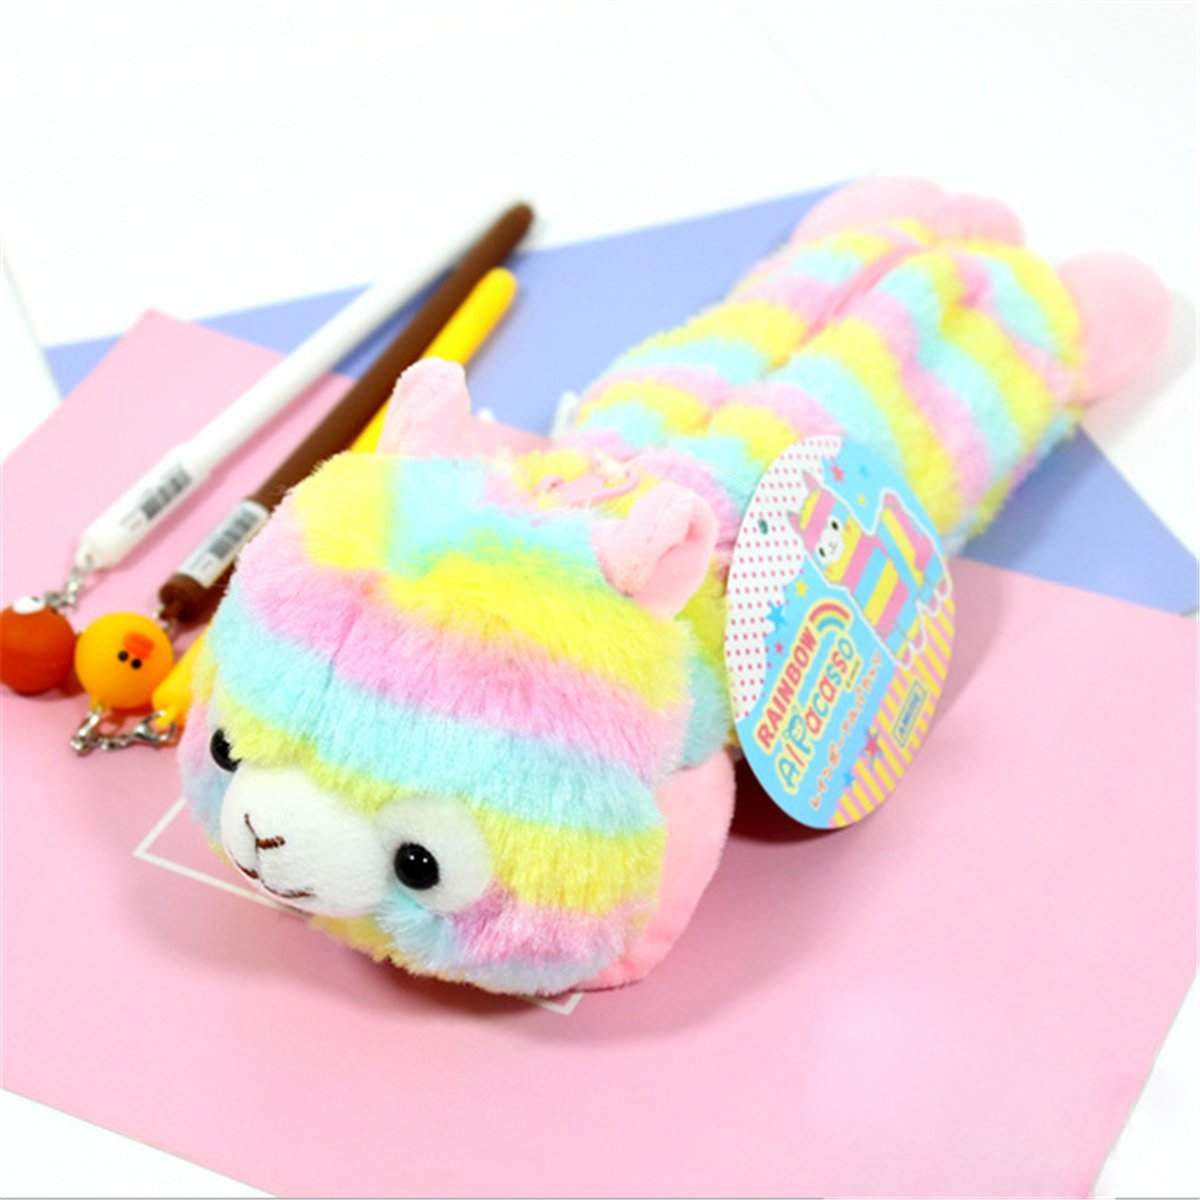 Alpacasso 10'' Plush Rainbow Alpaca Pencil Bag, Cute Soft Stuffed Animals Stationery Bag. (Pink)